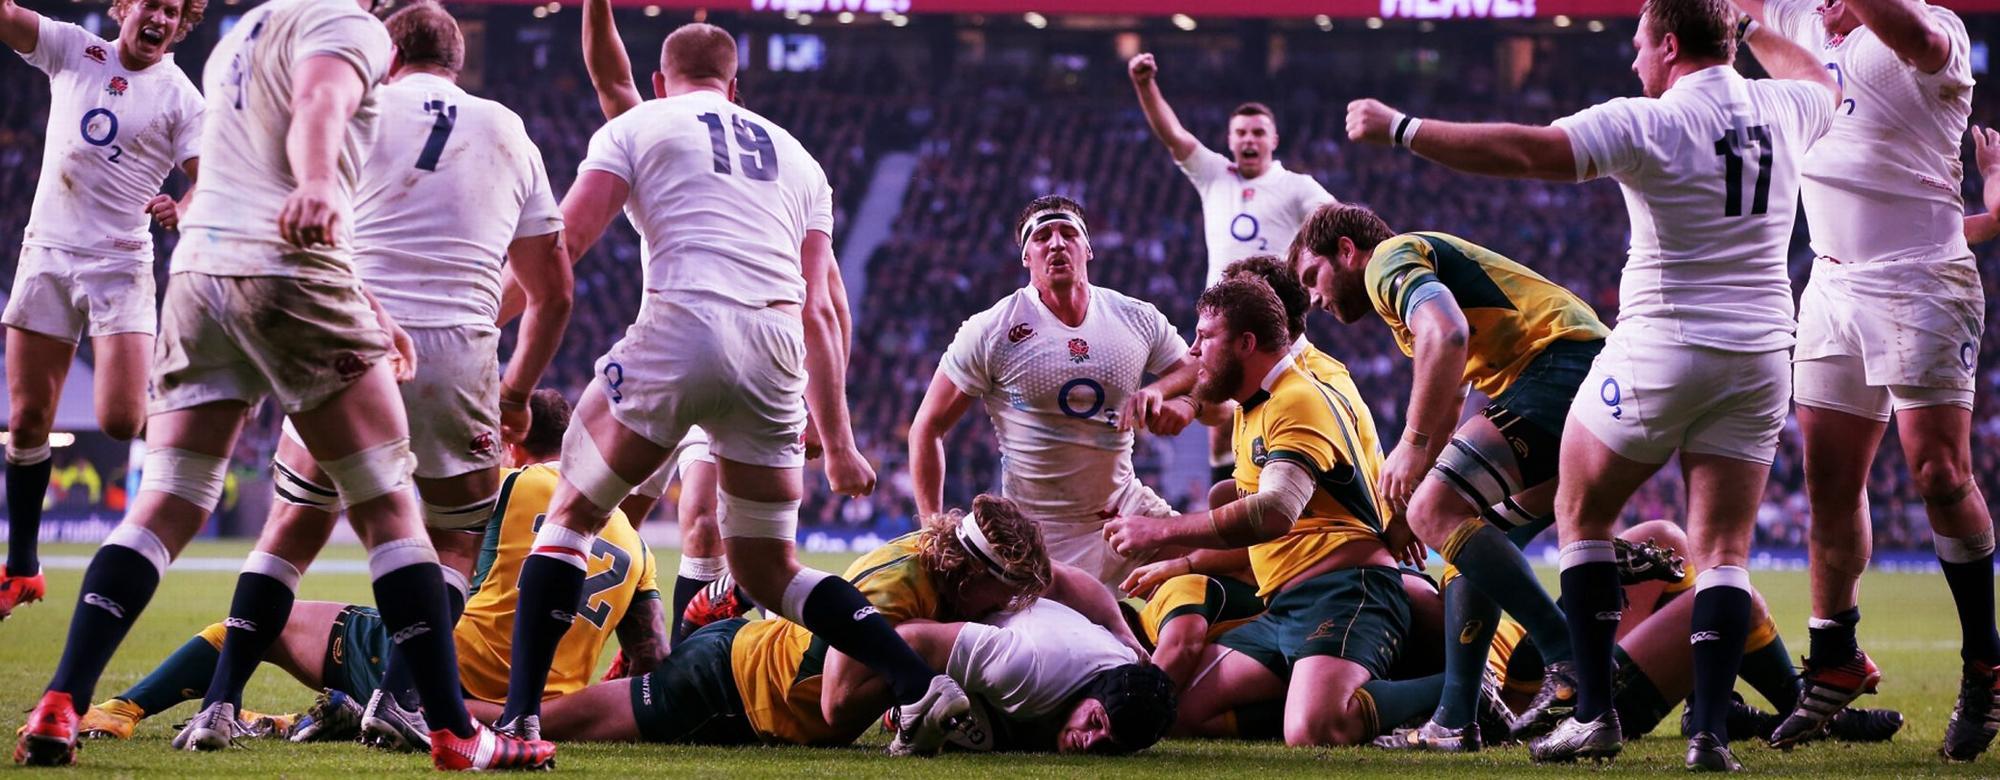 Rugby Match at Twickenham